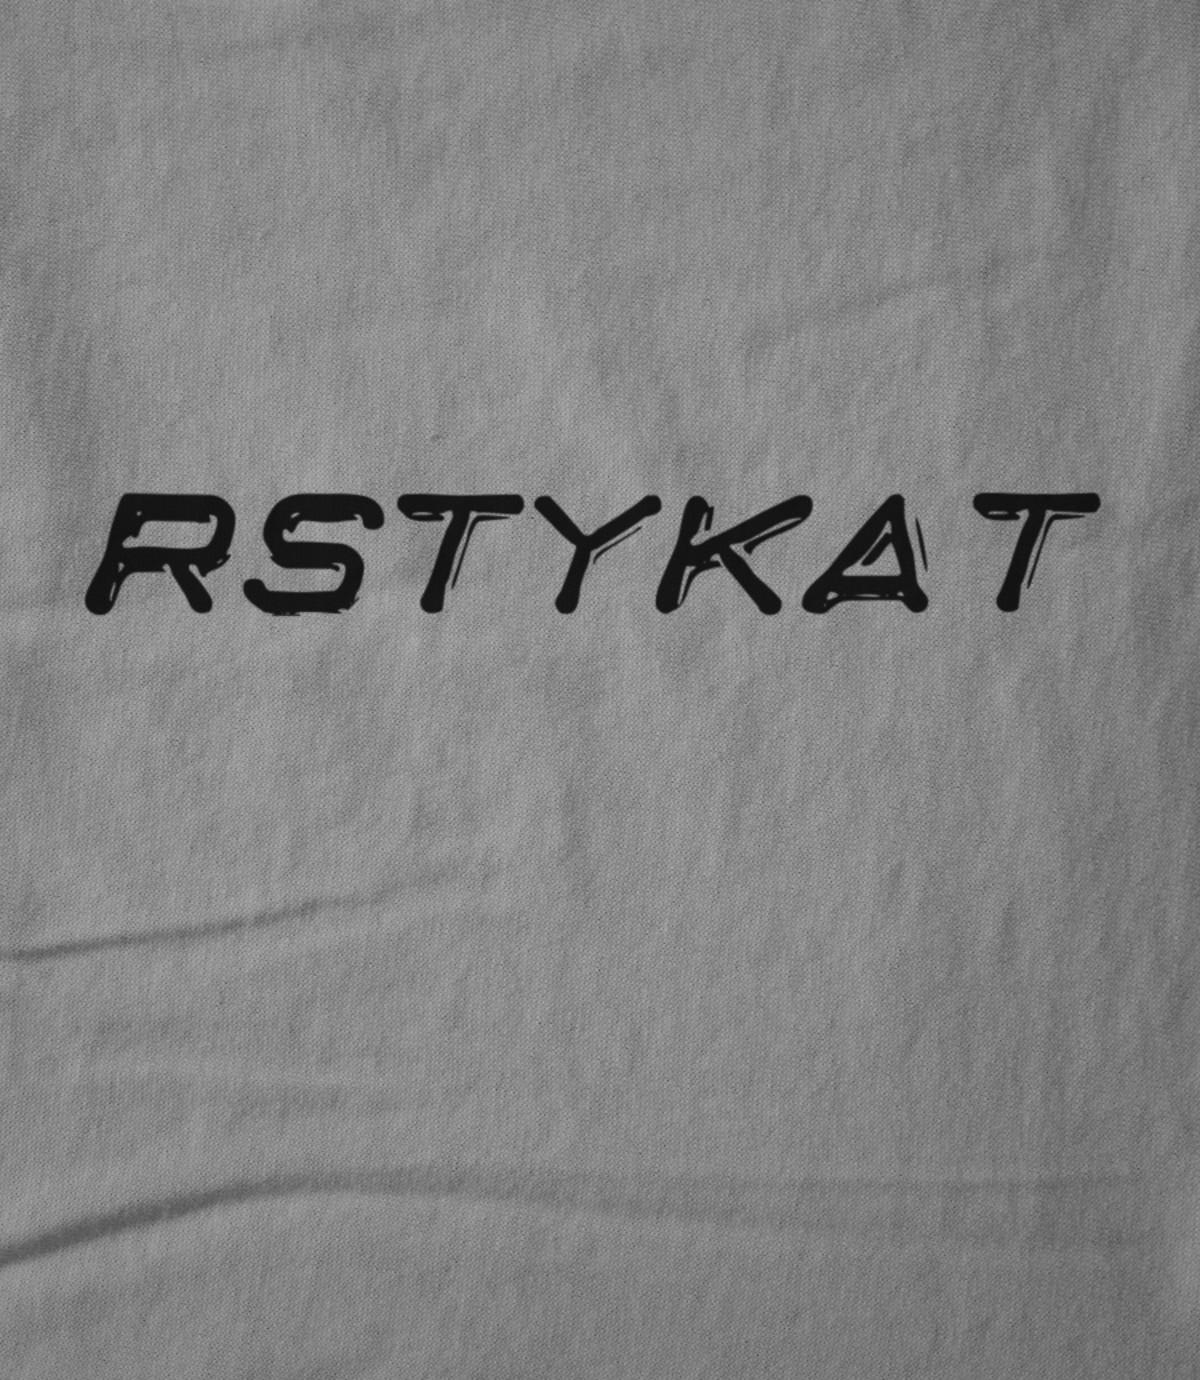 Rstykat rstykat scratch 1545588895